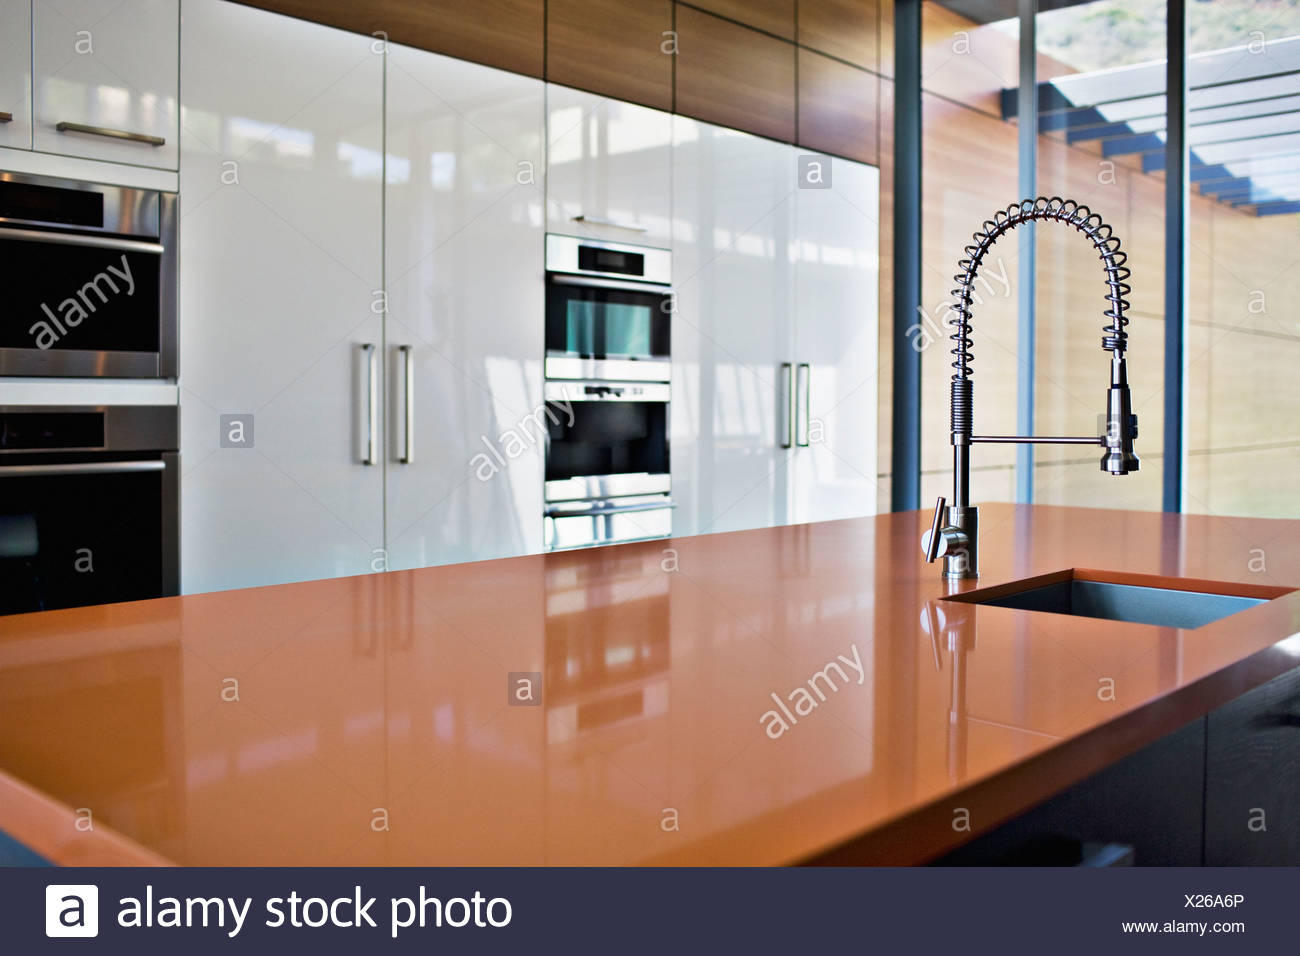 Interior of modern kitchen with spray nozzle Stock Photo ...